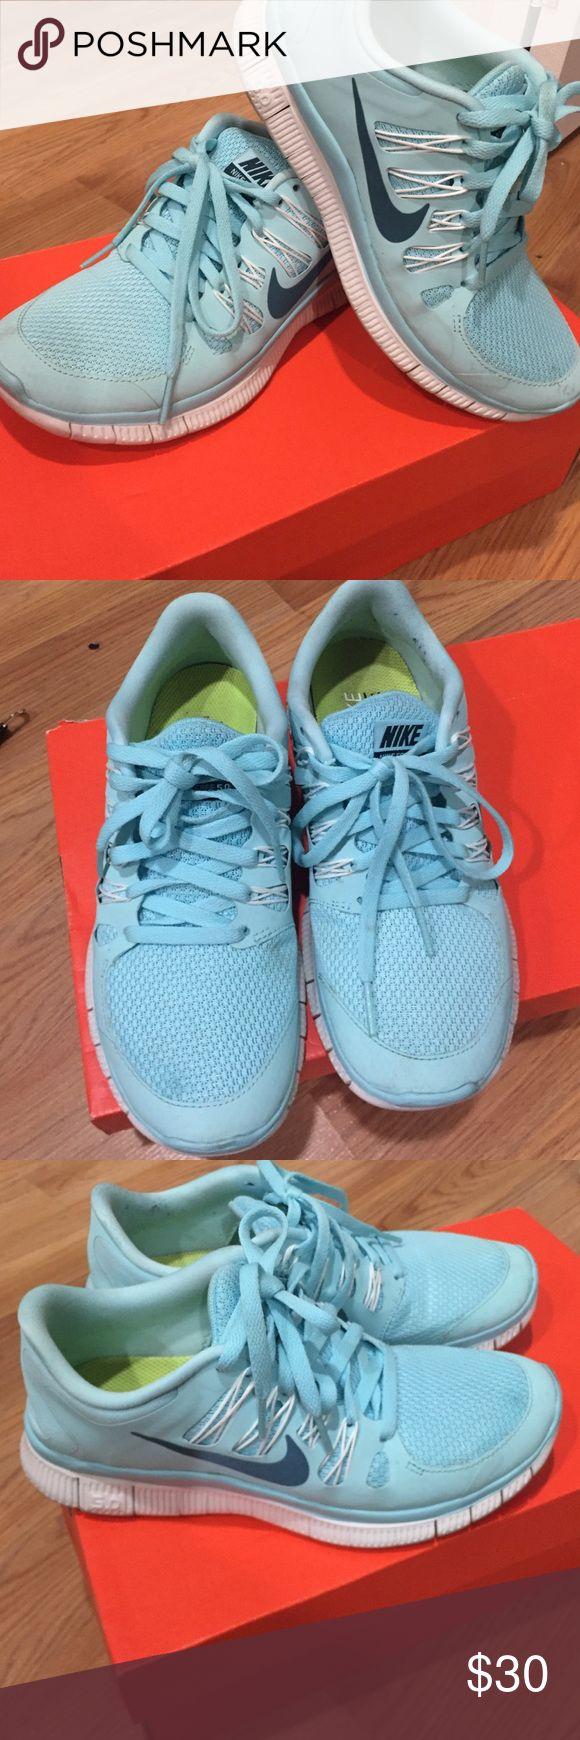 Light Blue Nike Free Run 5.0 Light blue/Tiffany Blue Nike Free Run 5.0 Used but fairly clean. Nike Shoes Sneakers